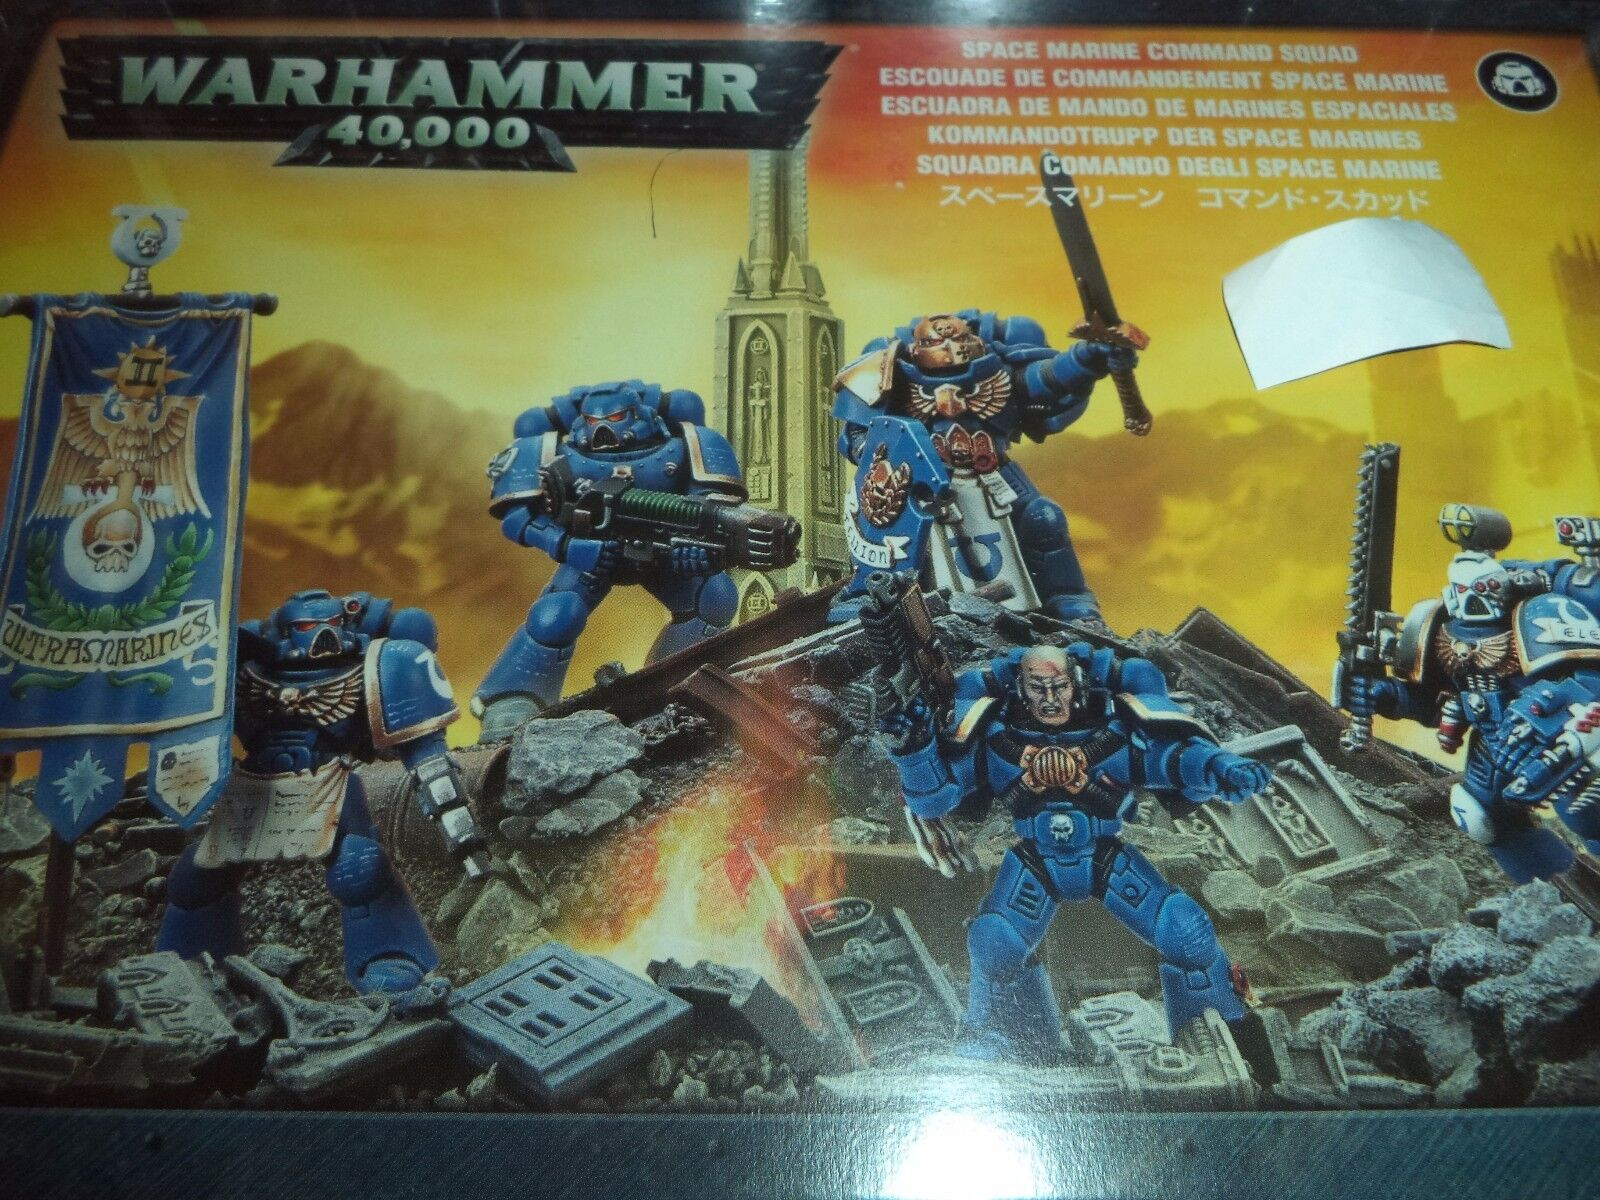 Space Marine Command Squad - Warhammer 40k 40,000 Games Workshop Model New